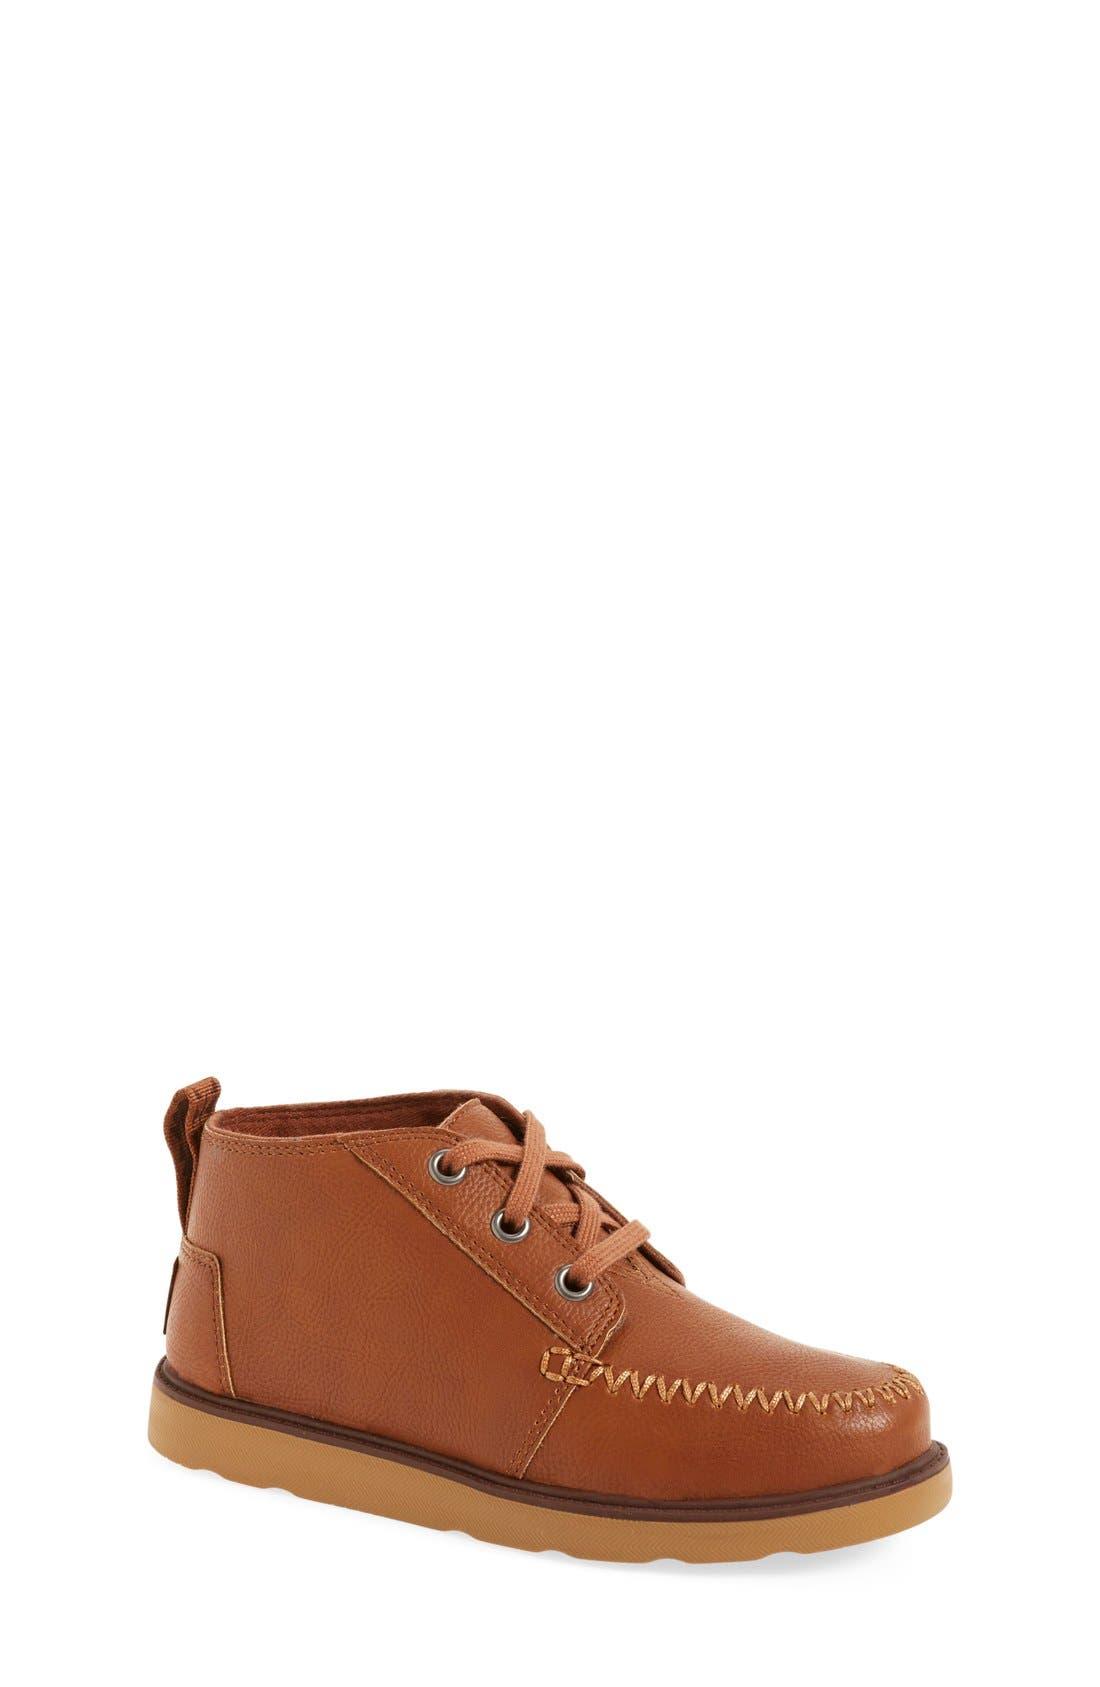 Chukka Boot,                         Main,                         color, 200